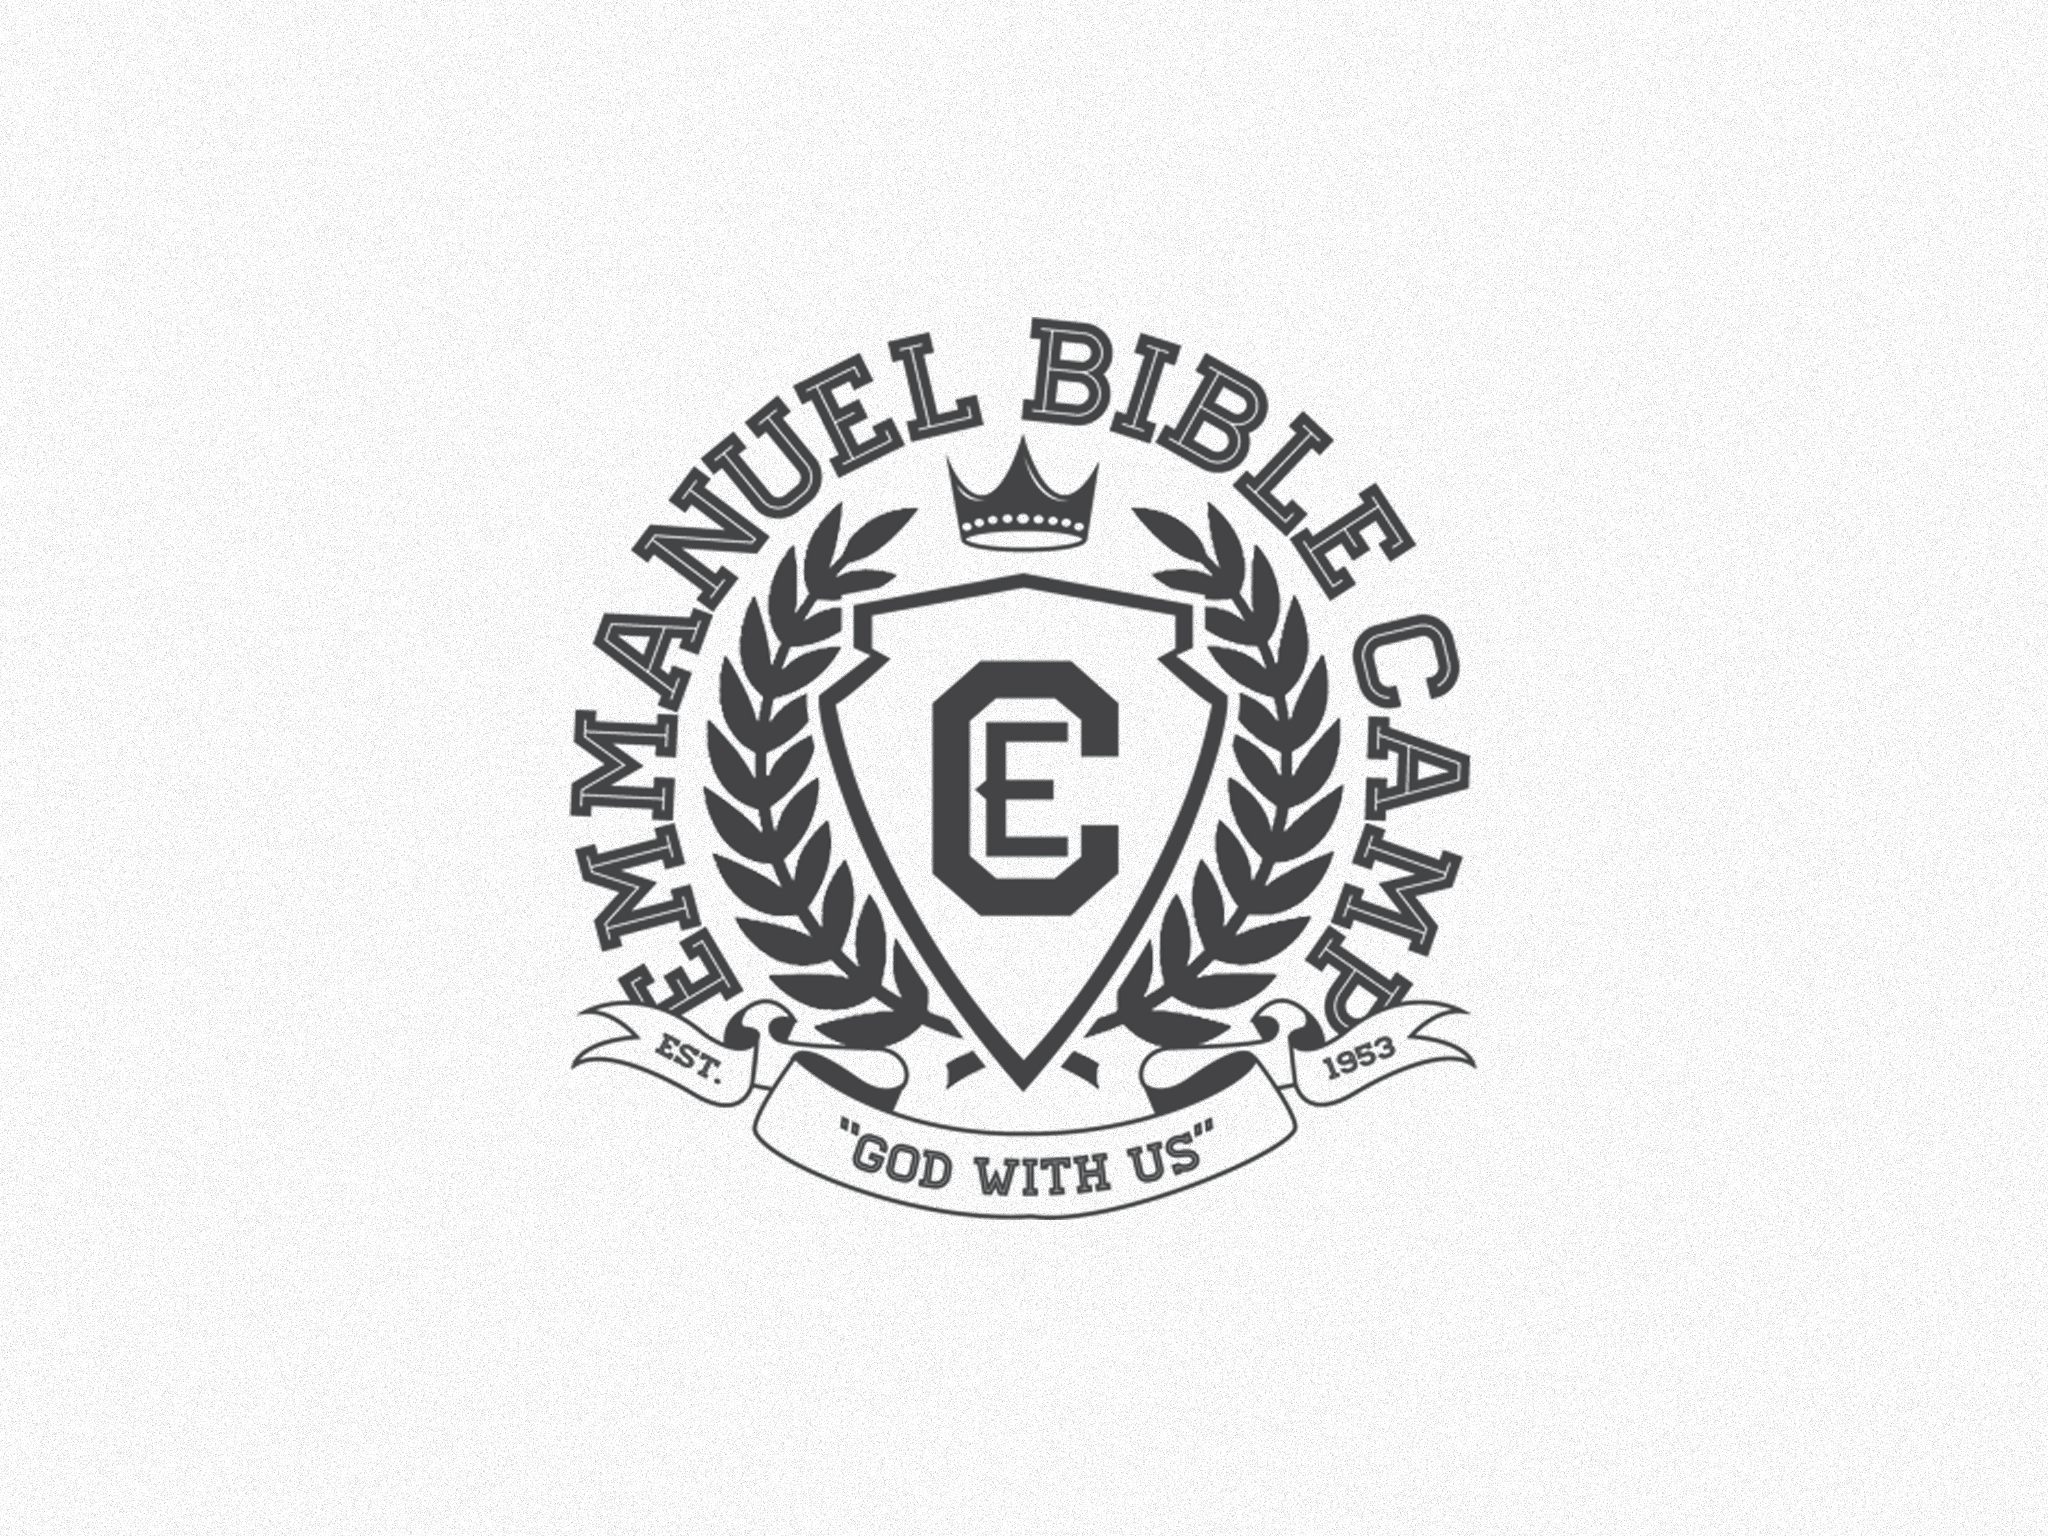 Ebc white